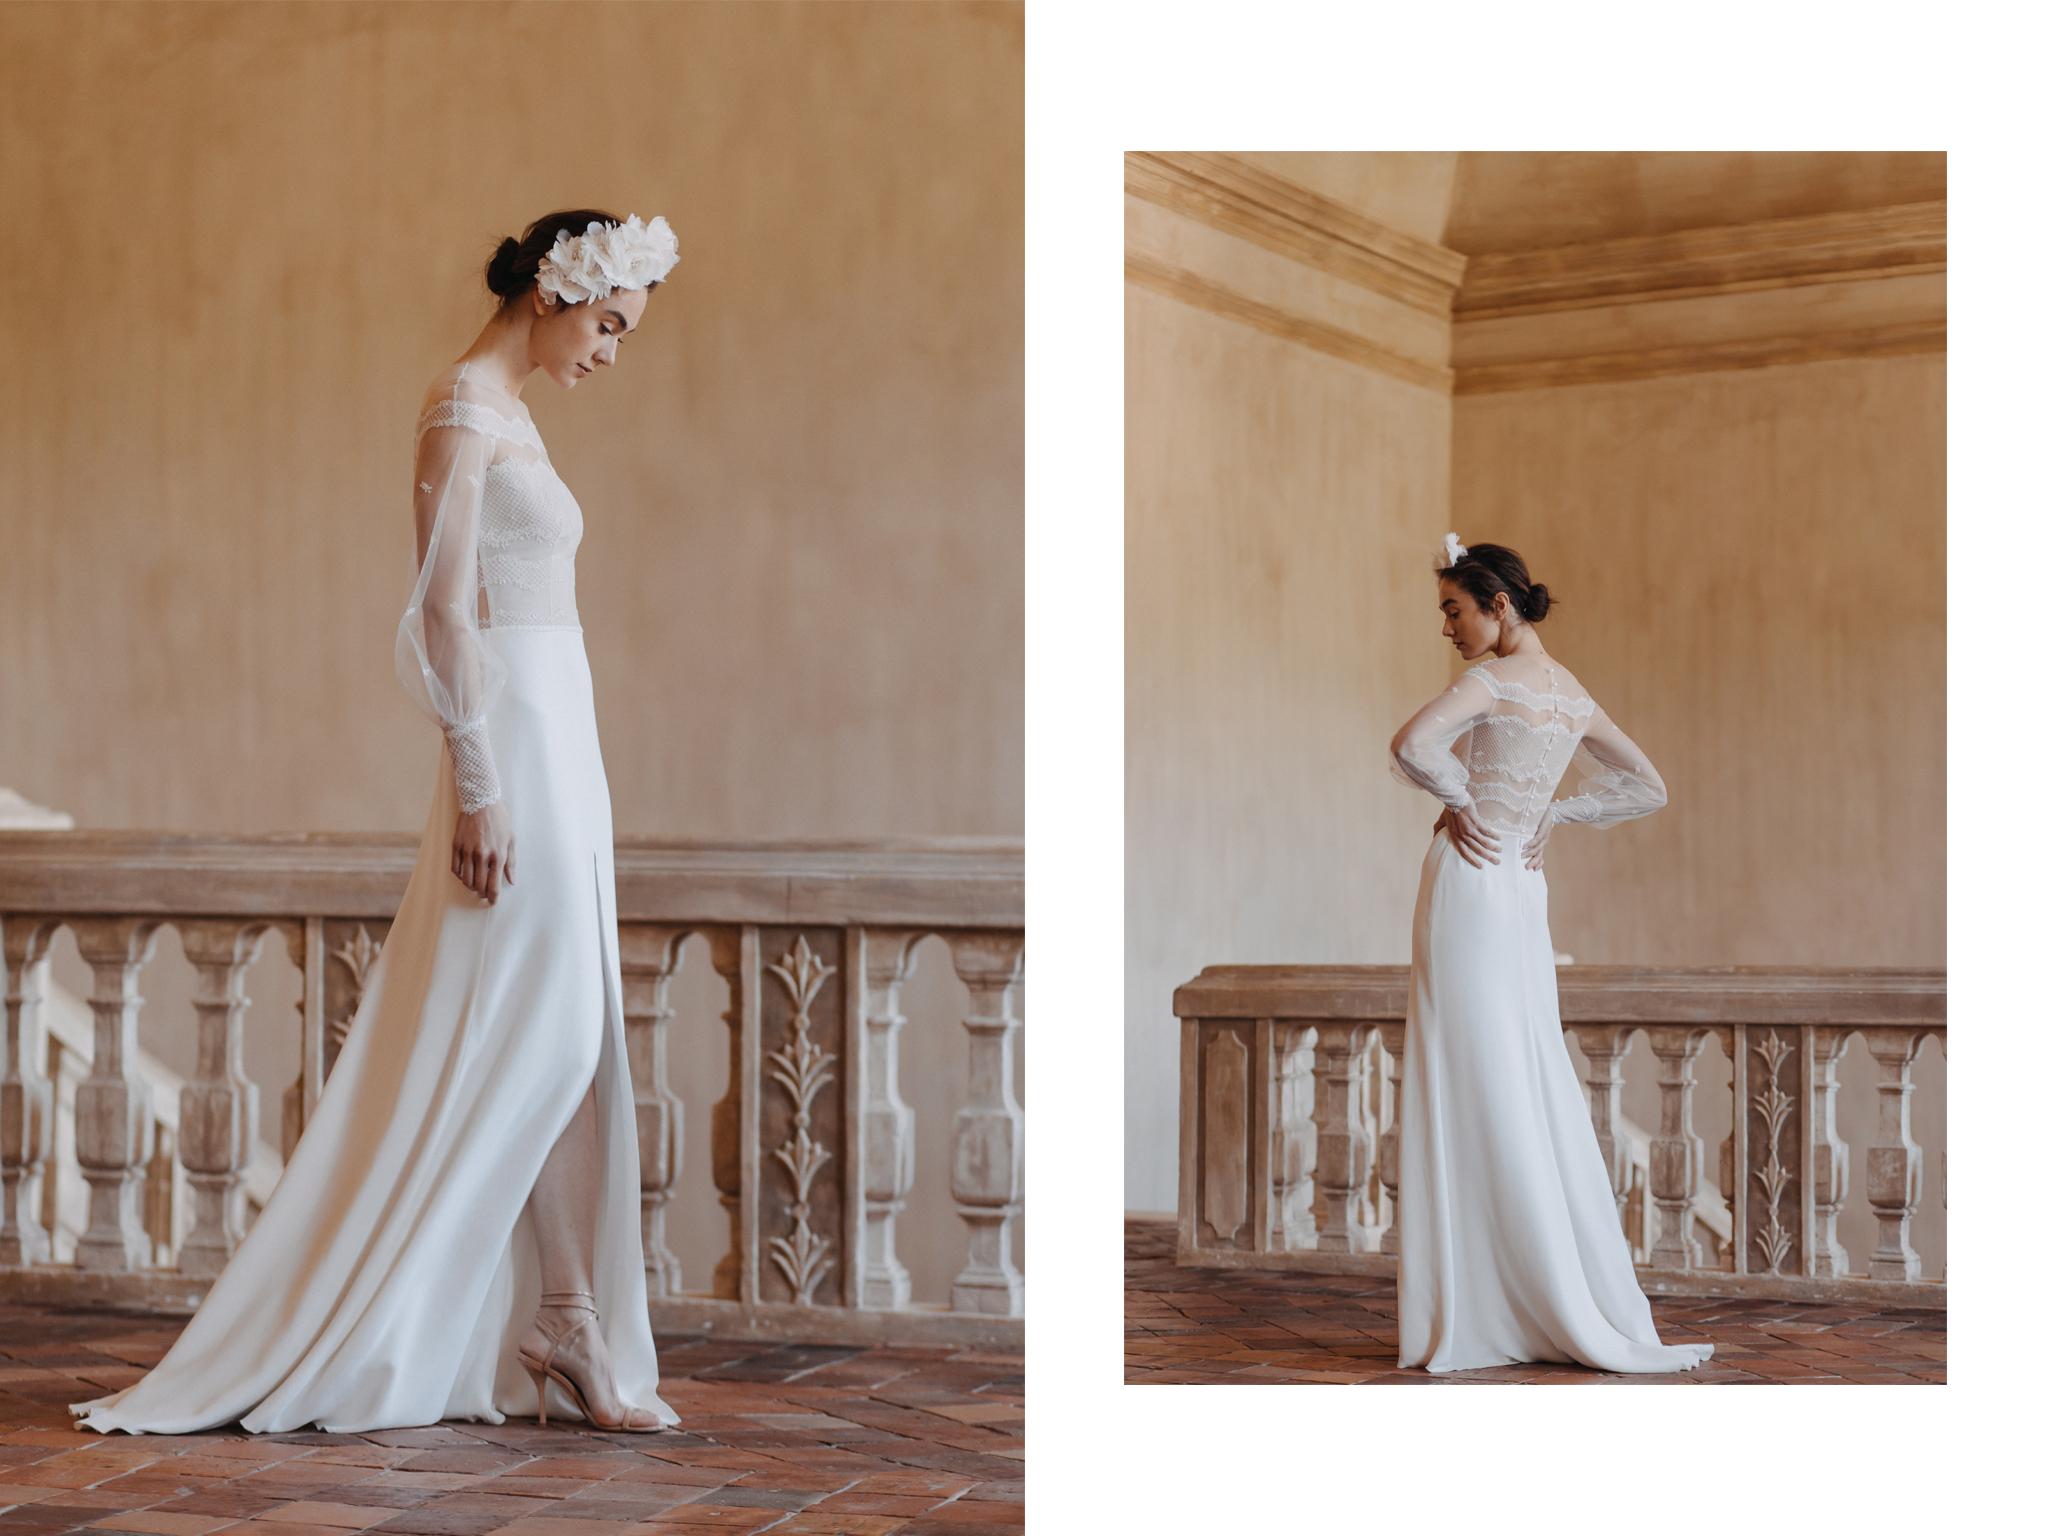 rochie de mireasa silueta tip clepsidra divine atelier